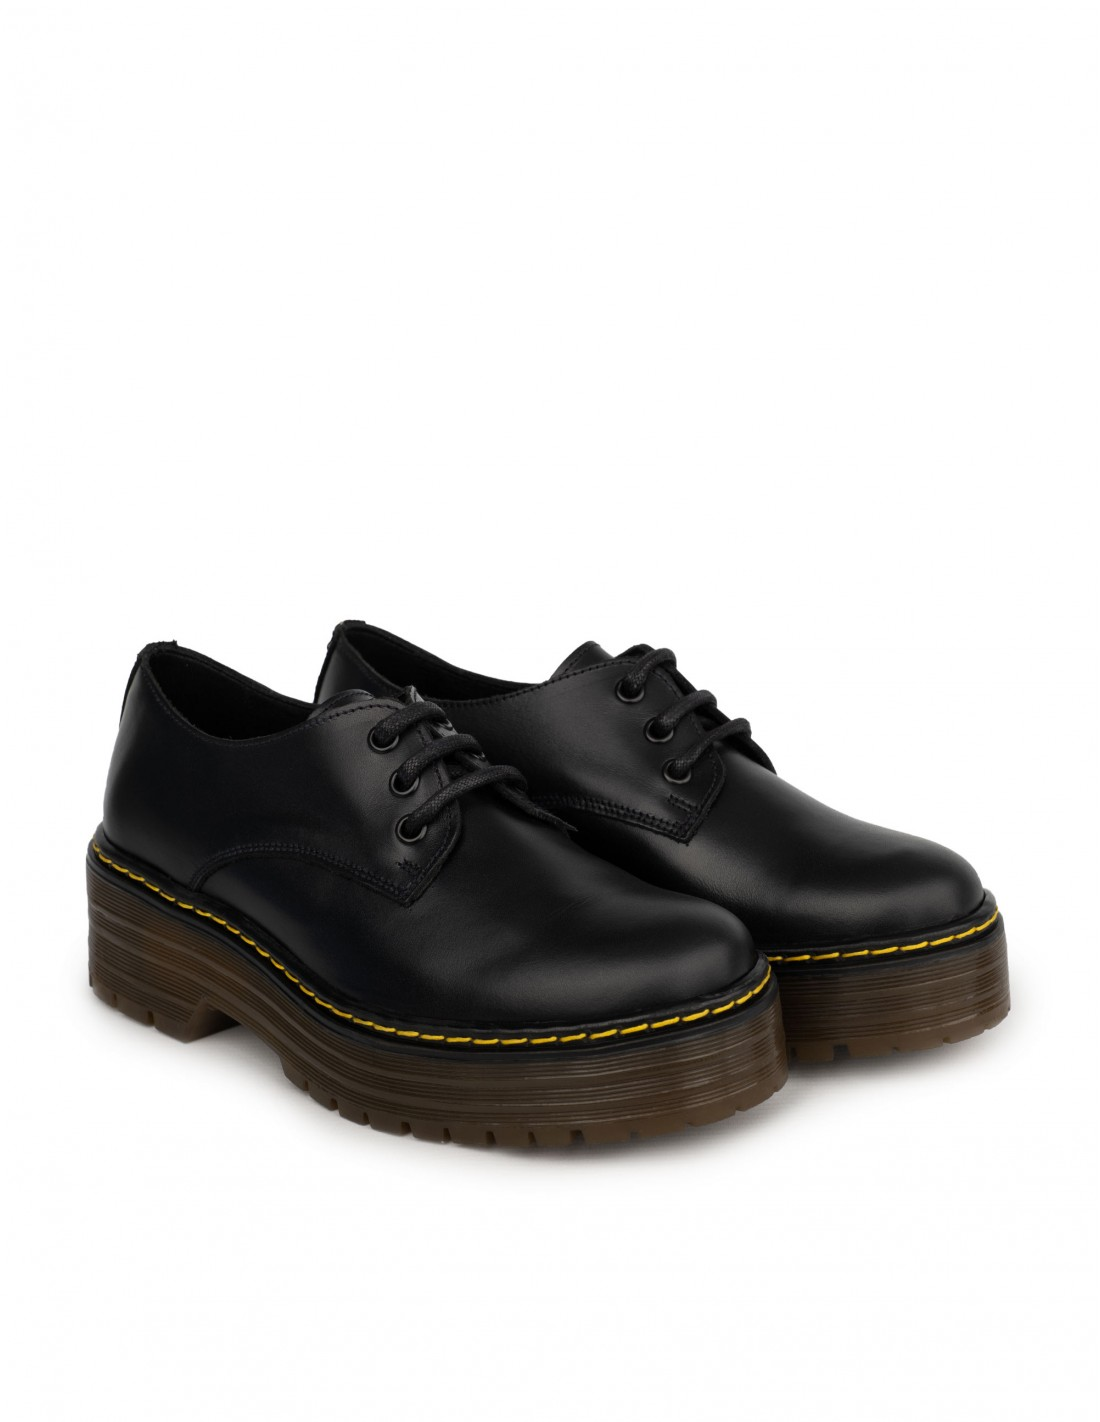 Zapatos Masculinos Mujer Plataforma PERA LIMONERA